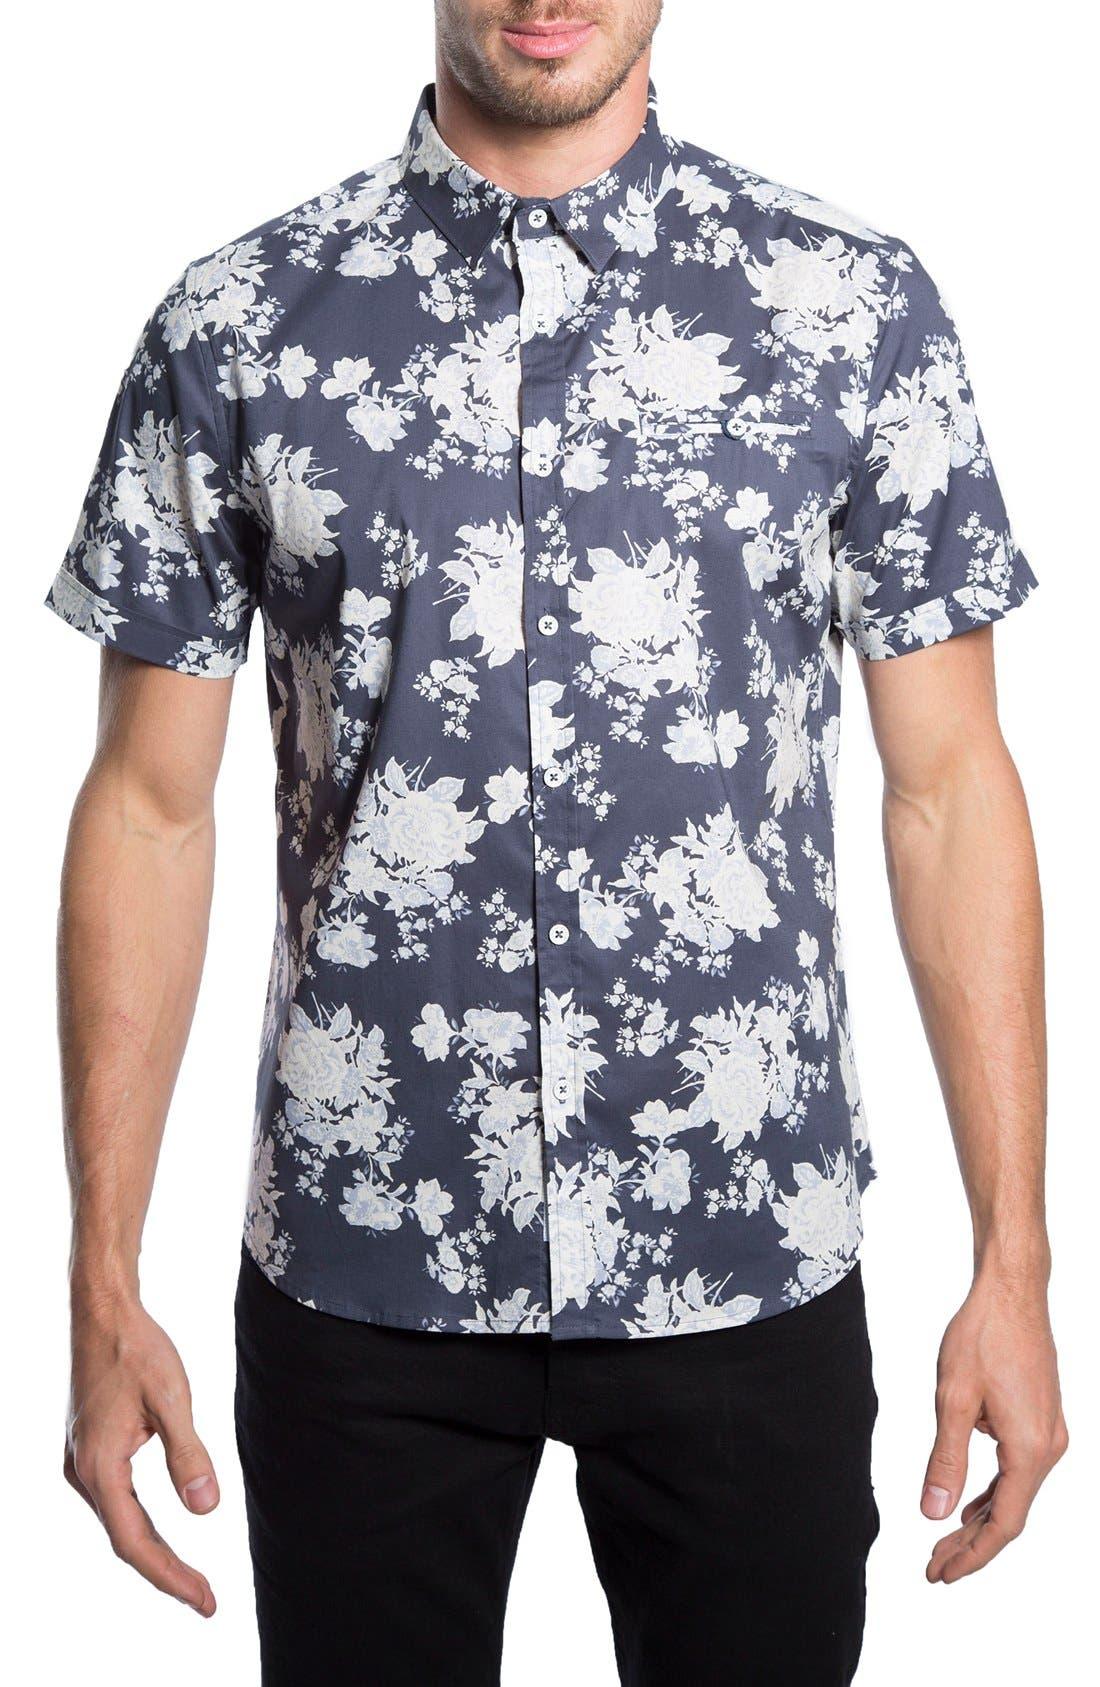 'Better Place' Trim Fit Floral Short Sleeve Woven Shirt,                             Main thumbnail 1, color,                             Navy